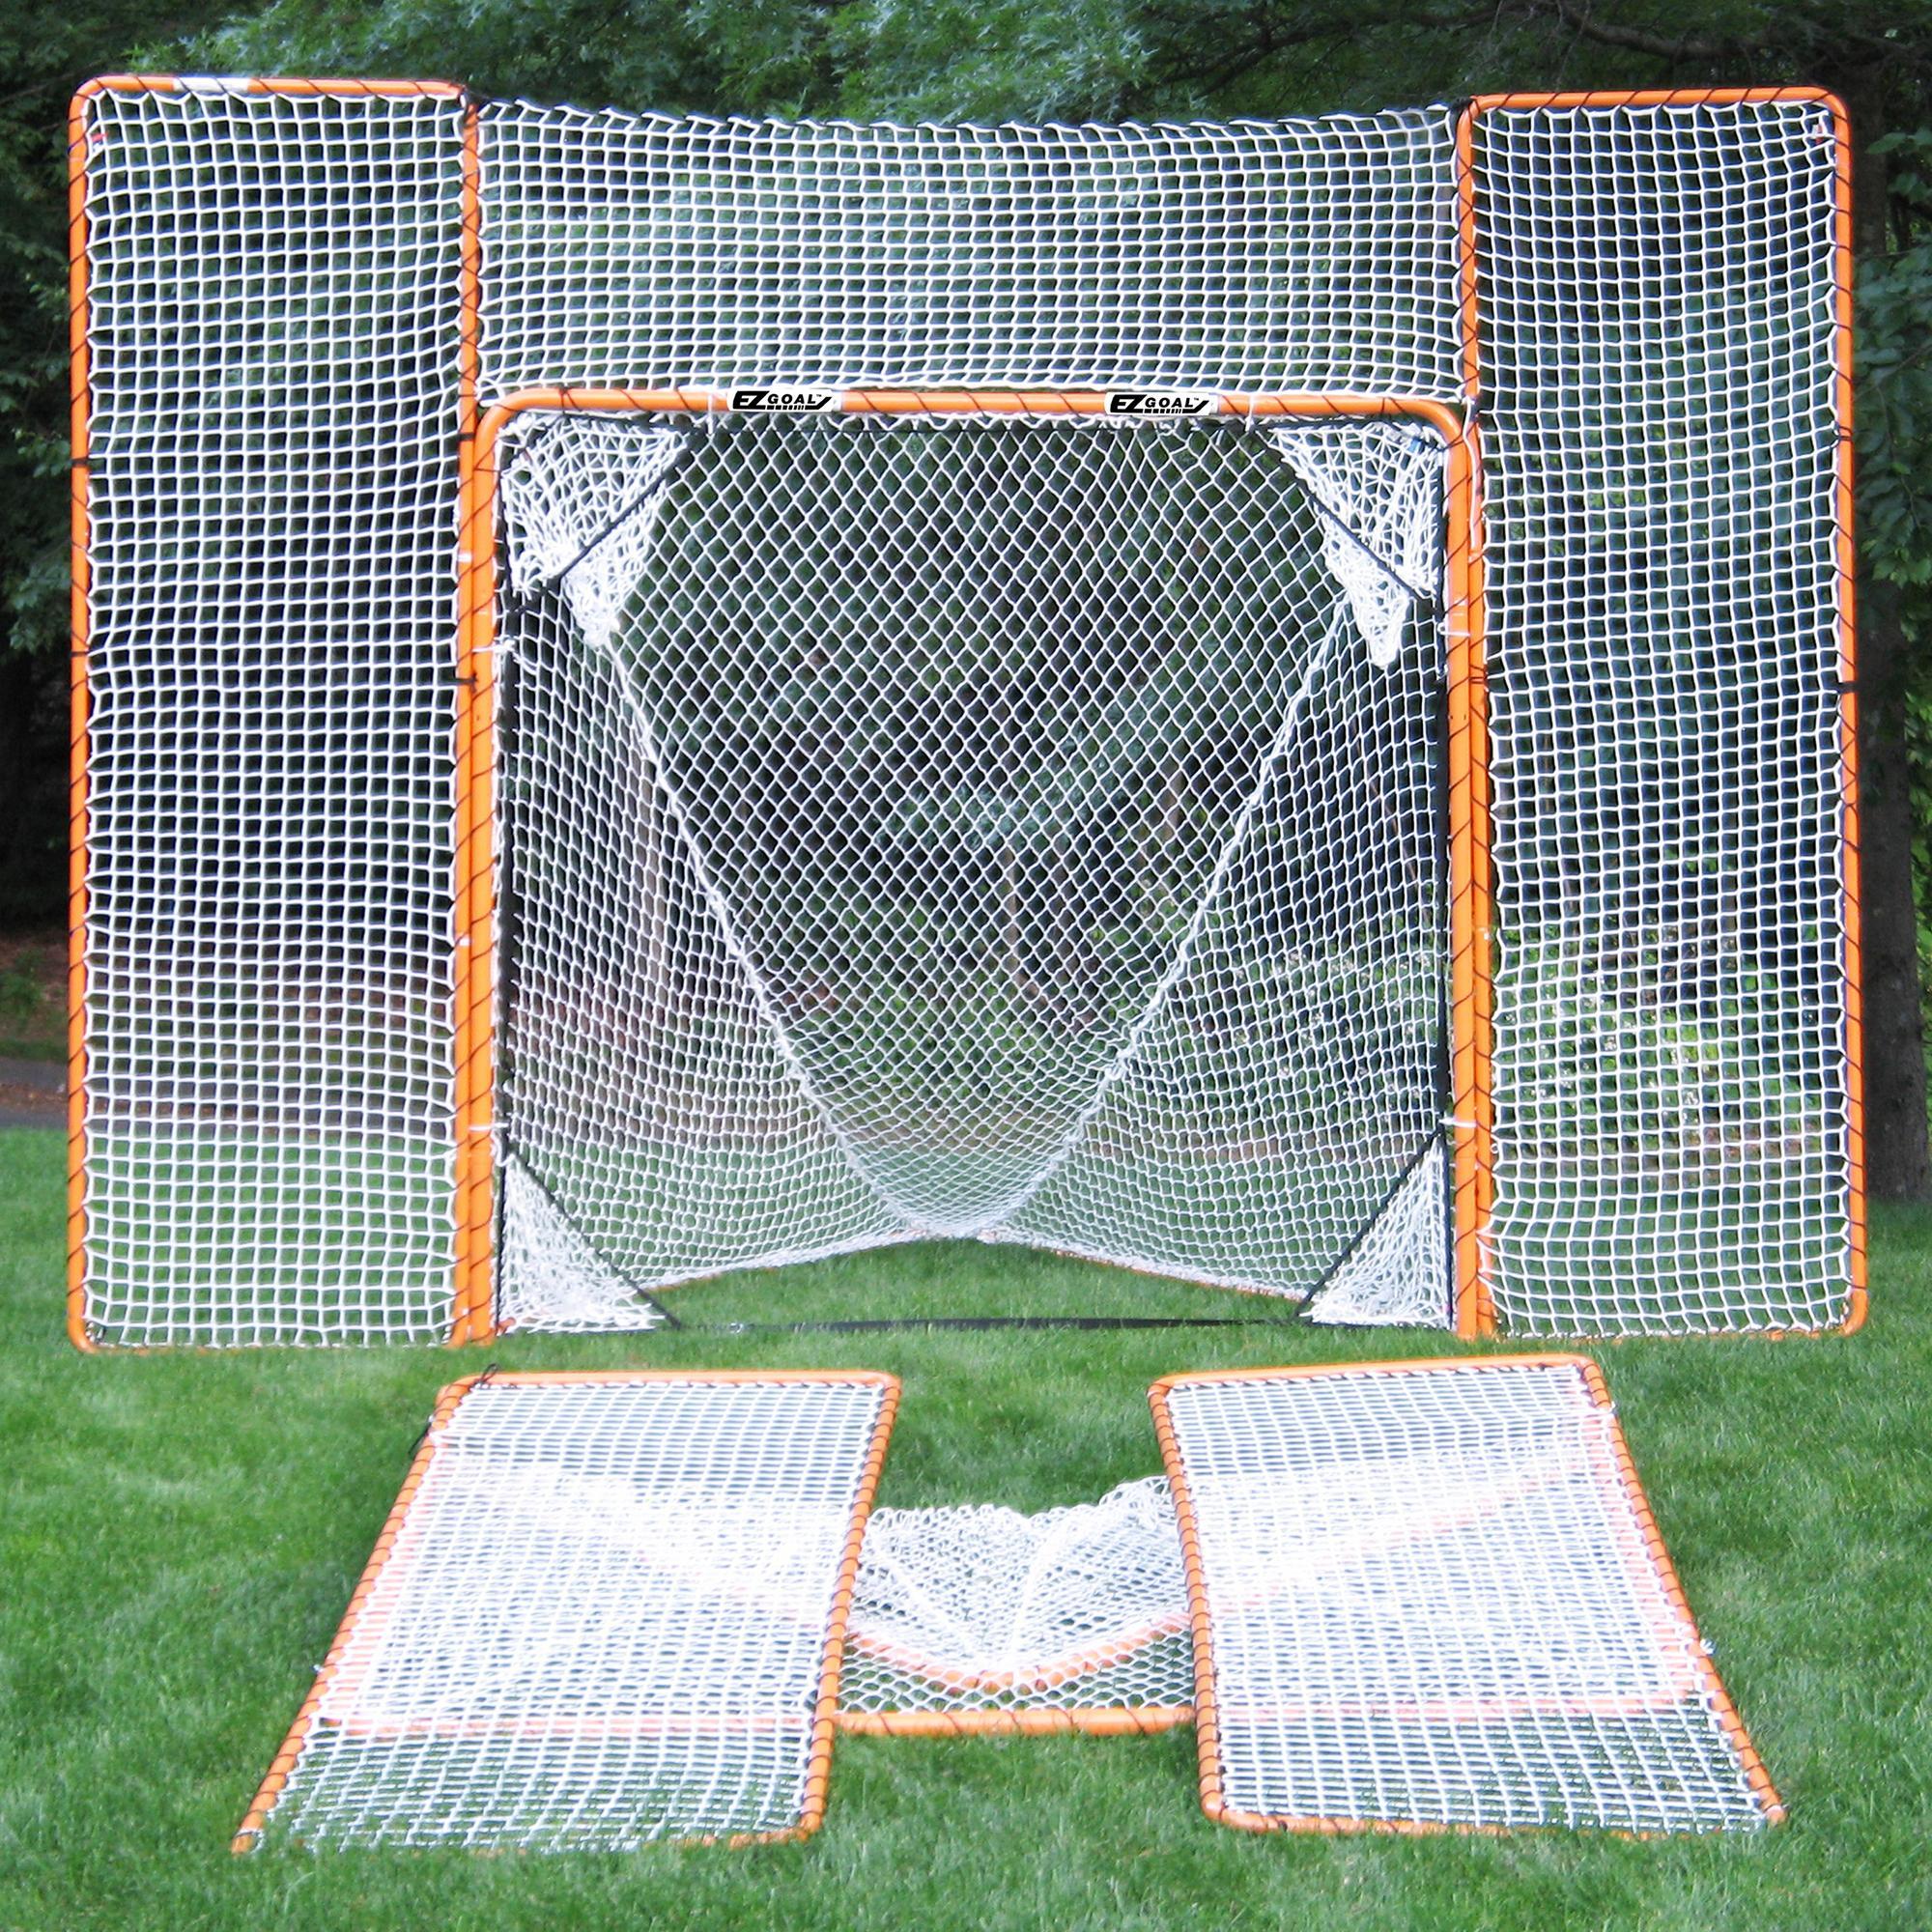 Amazon Com Ezgoal Lacrosse Folding Goal With Backstop And